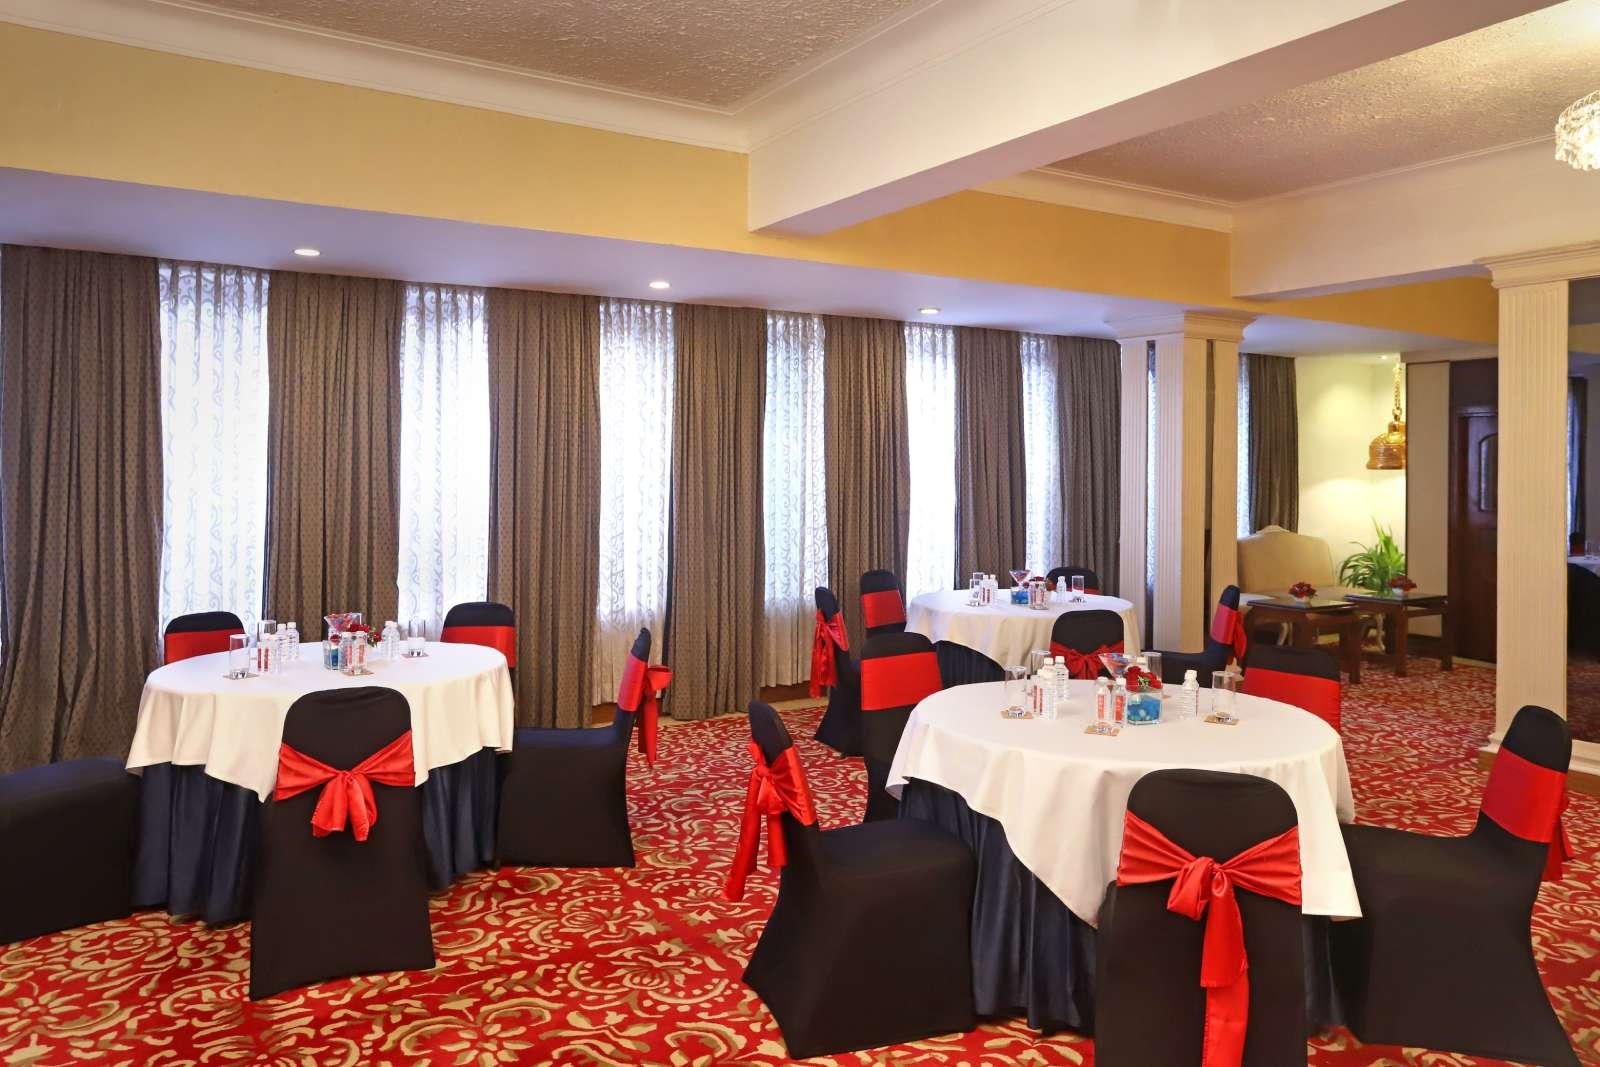 47 Banquet Hall - The Ambassador | Heritage Hotels in Mumbai, Aurangabad, Chennai - The Ambassador Mumbai